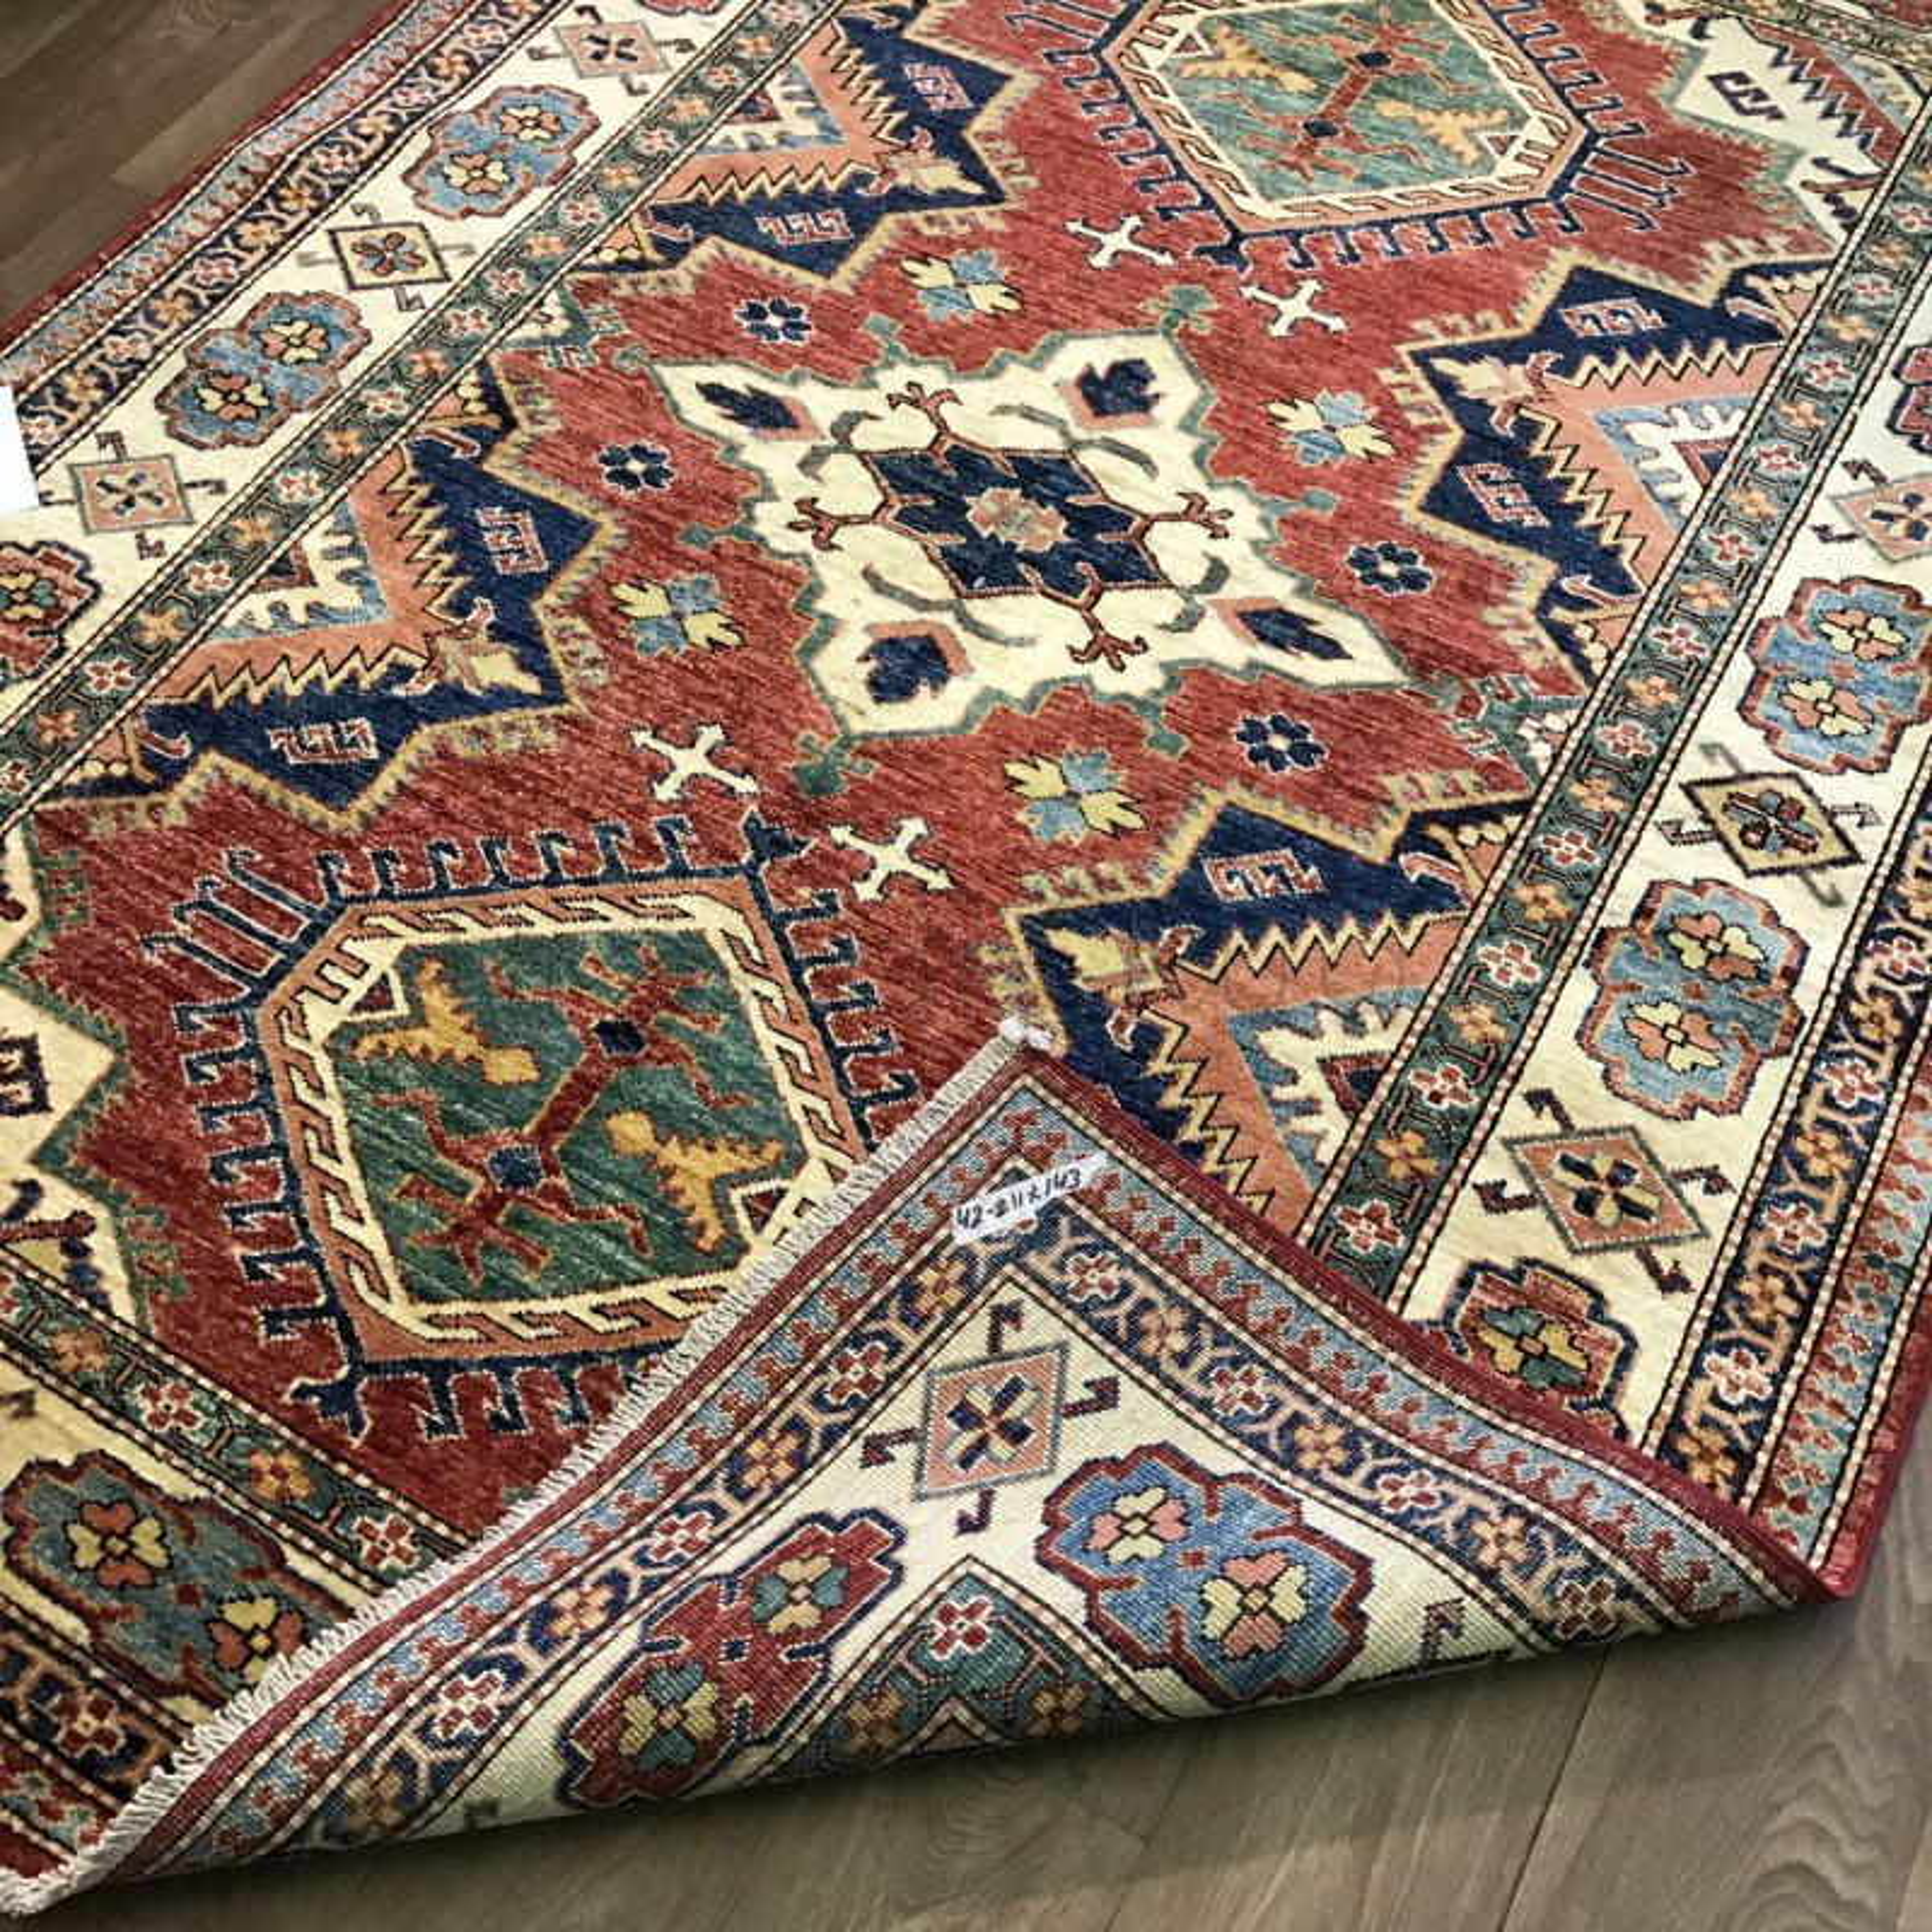 Afghan Kazak Rug: 143 X 211 Cm (4'8 X 6'11